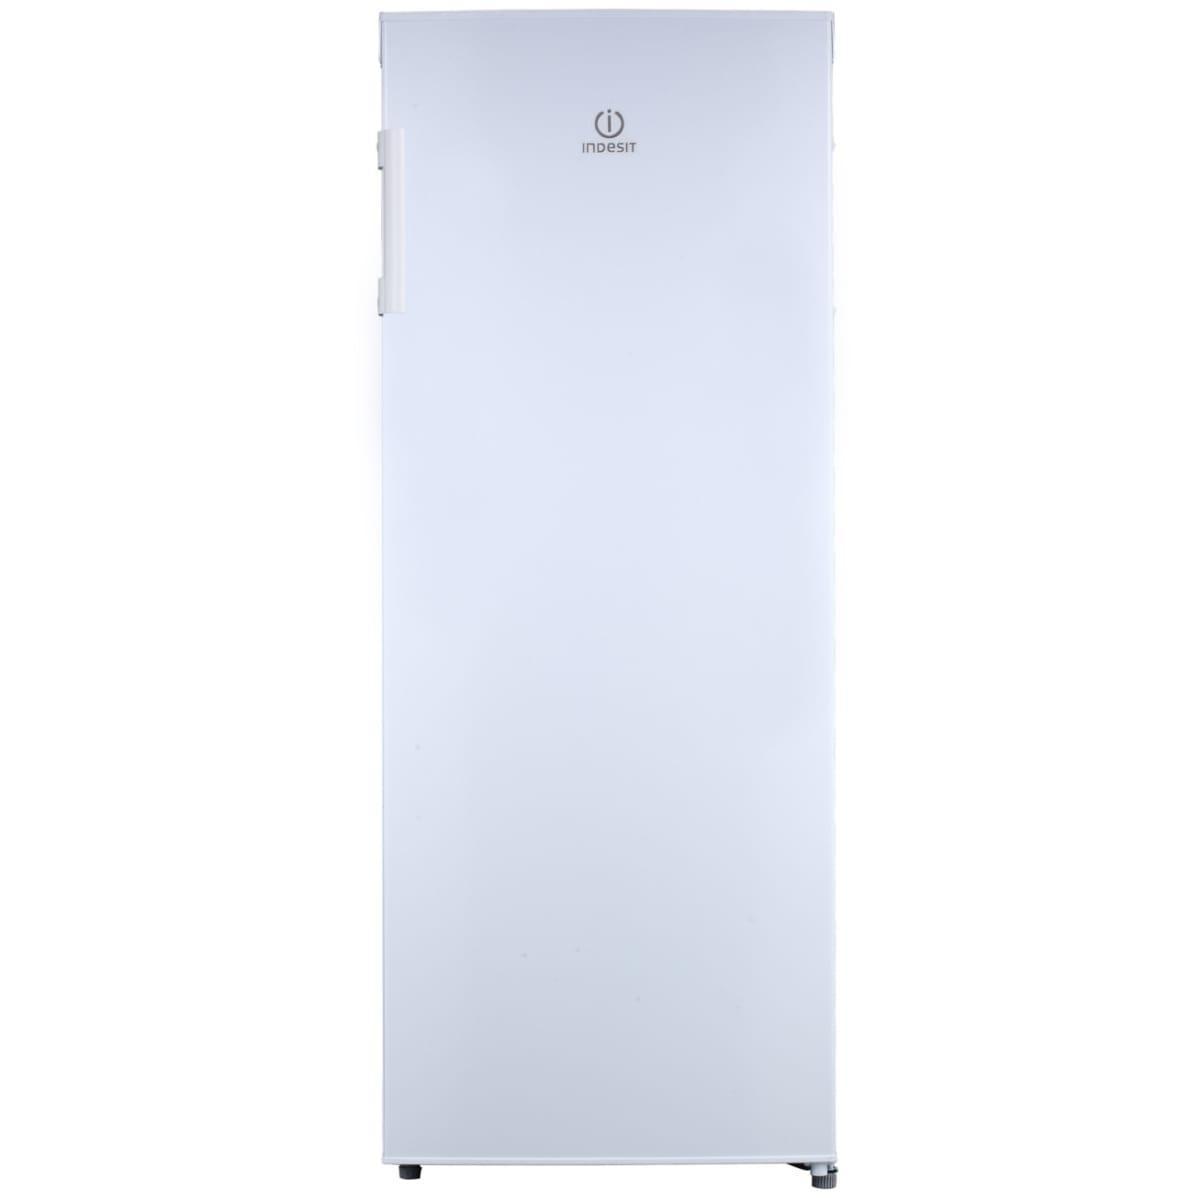 Réfrigérateur 1 porte Indesit SIAA 5